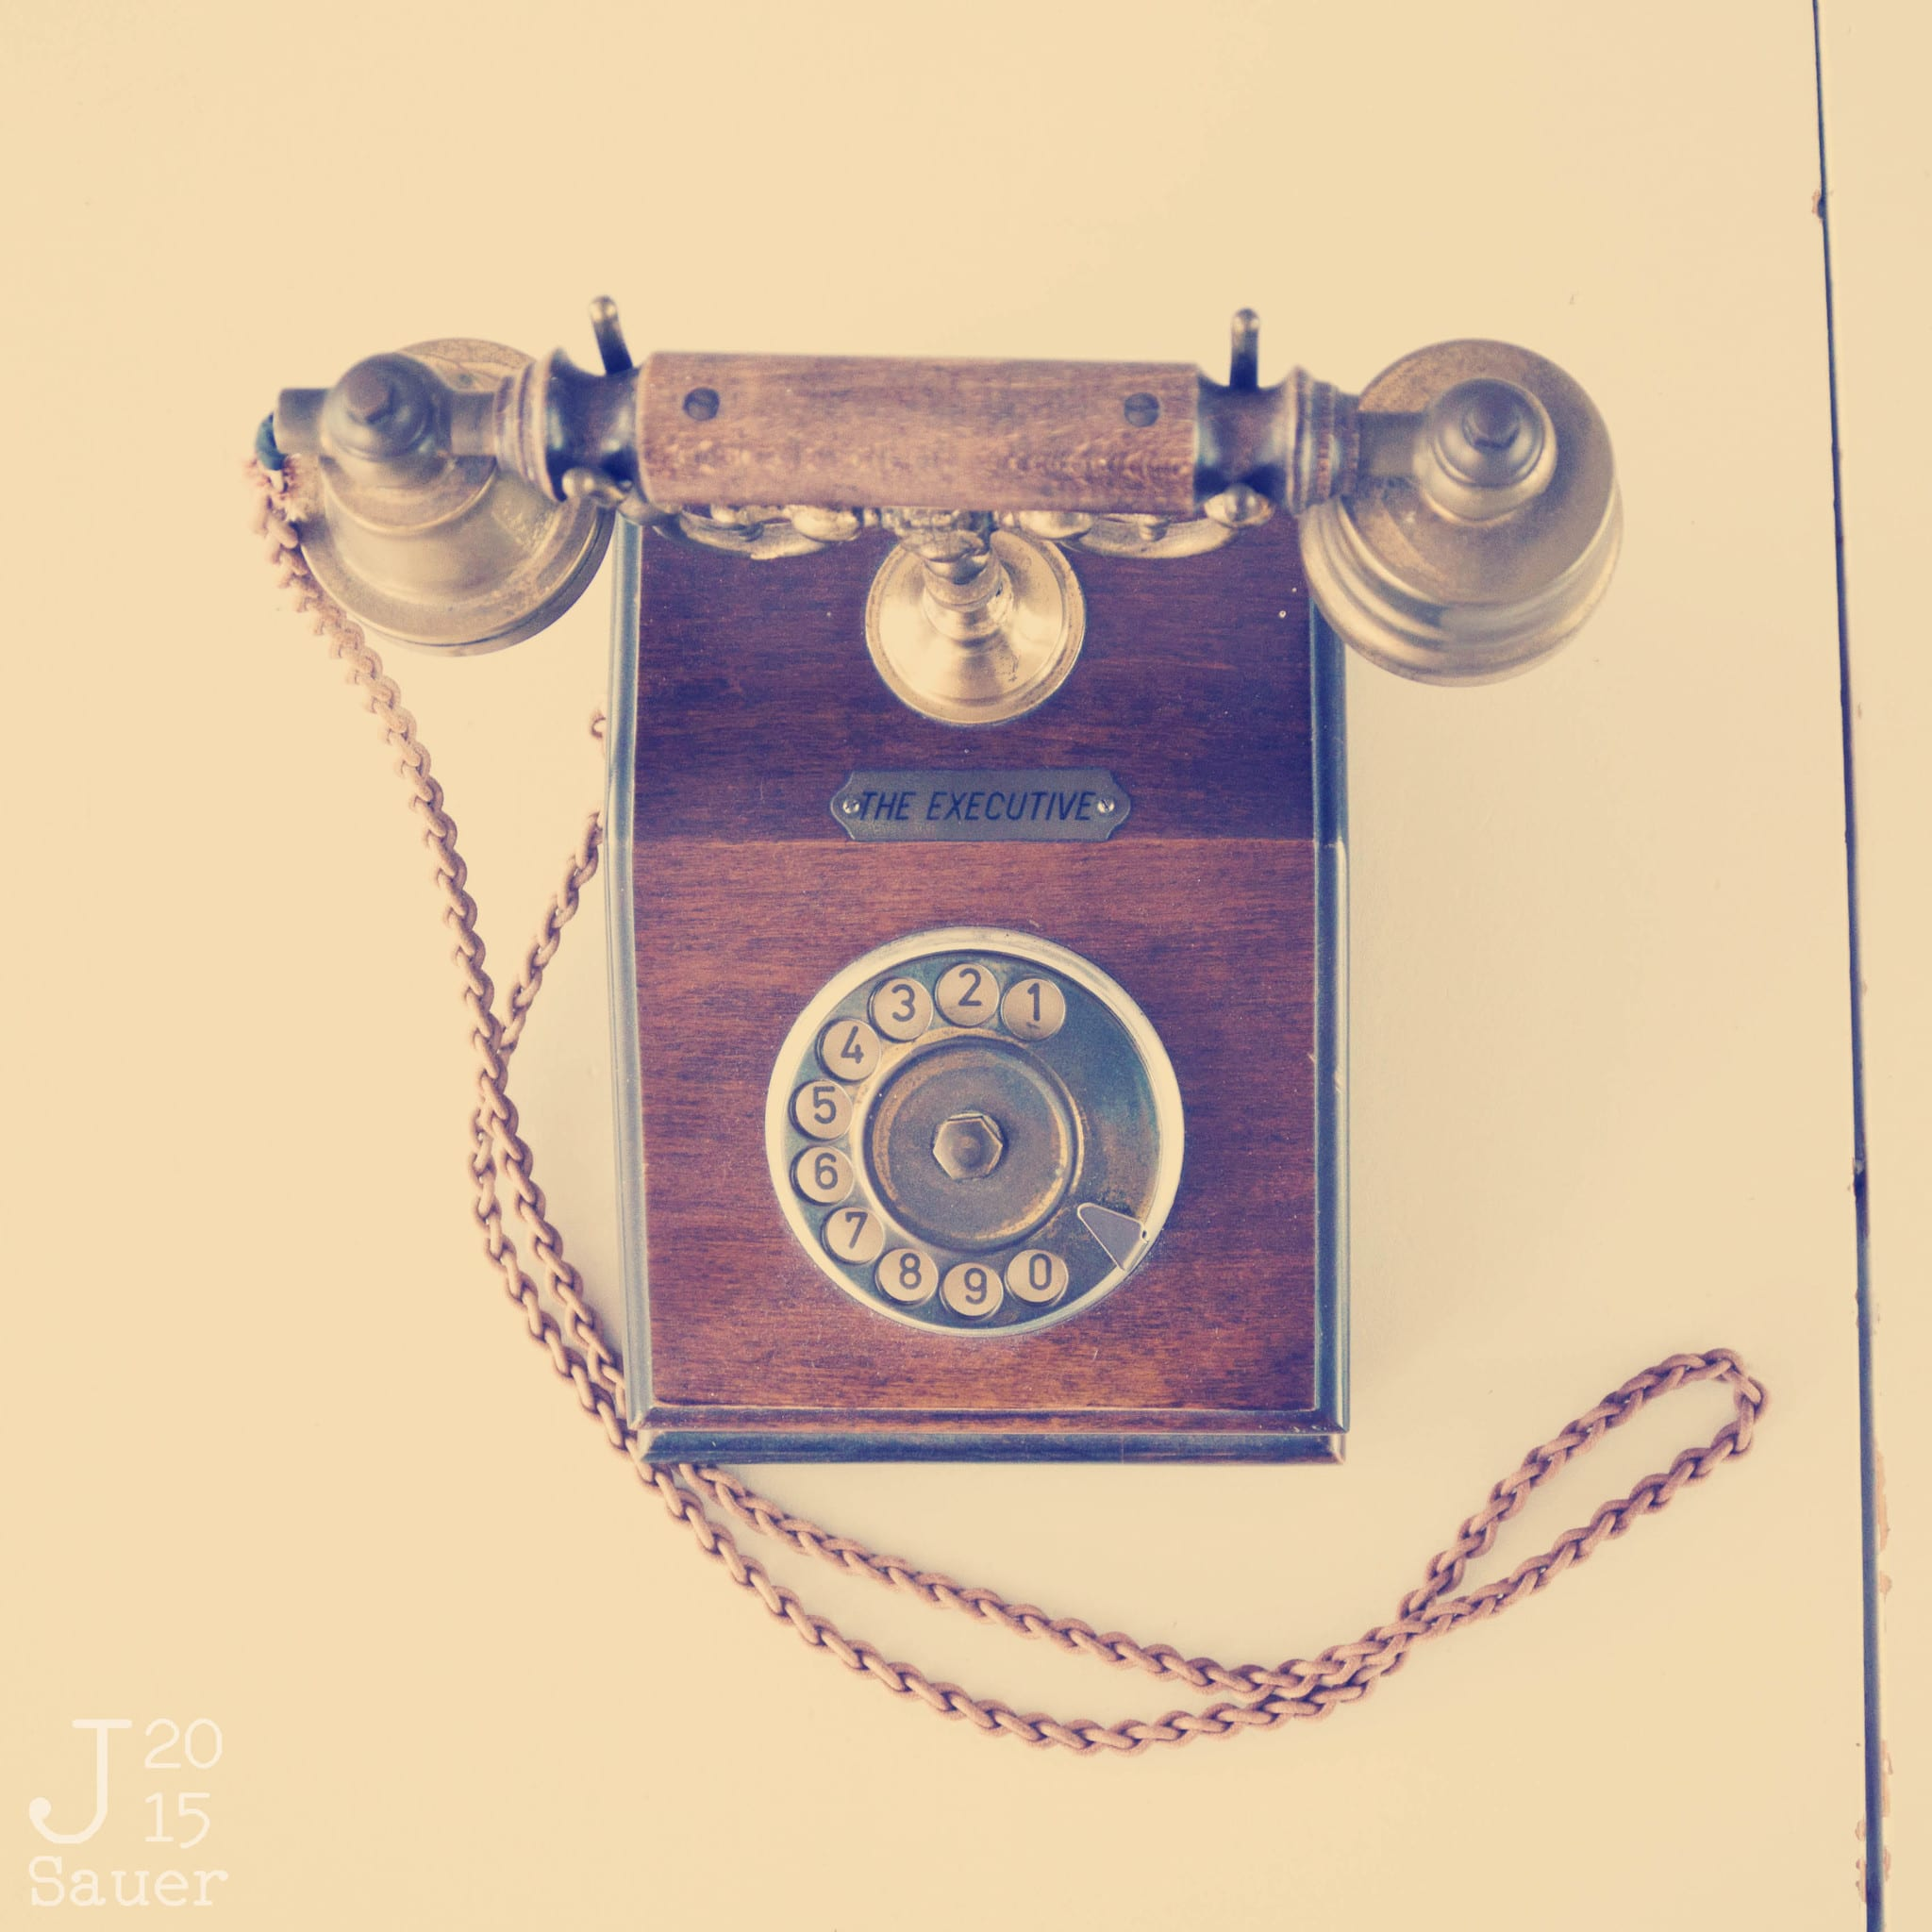 Tekstbureau 't Kofschaap retro telefoon